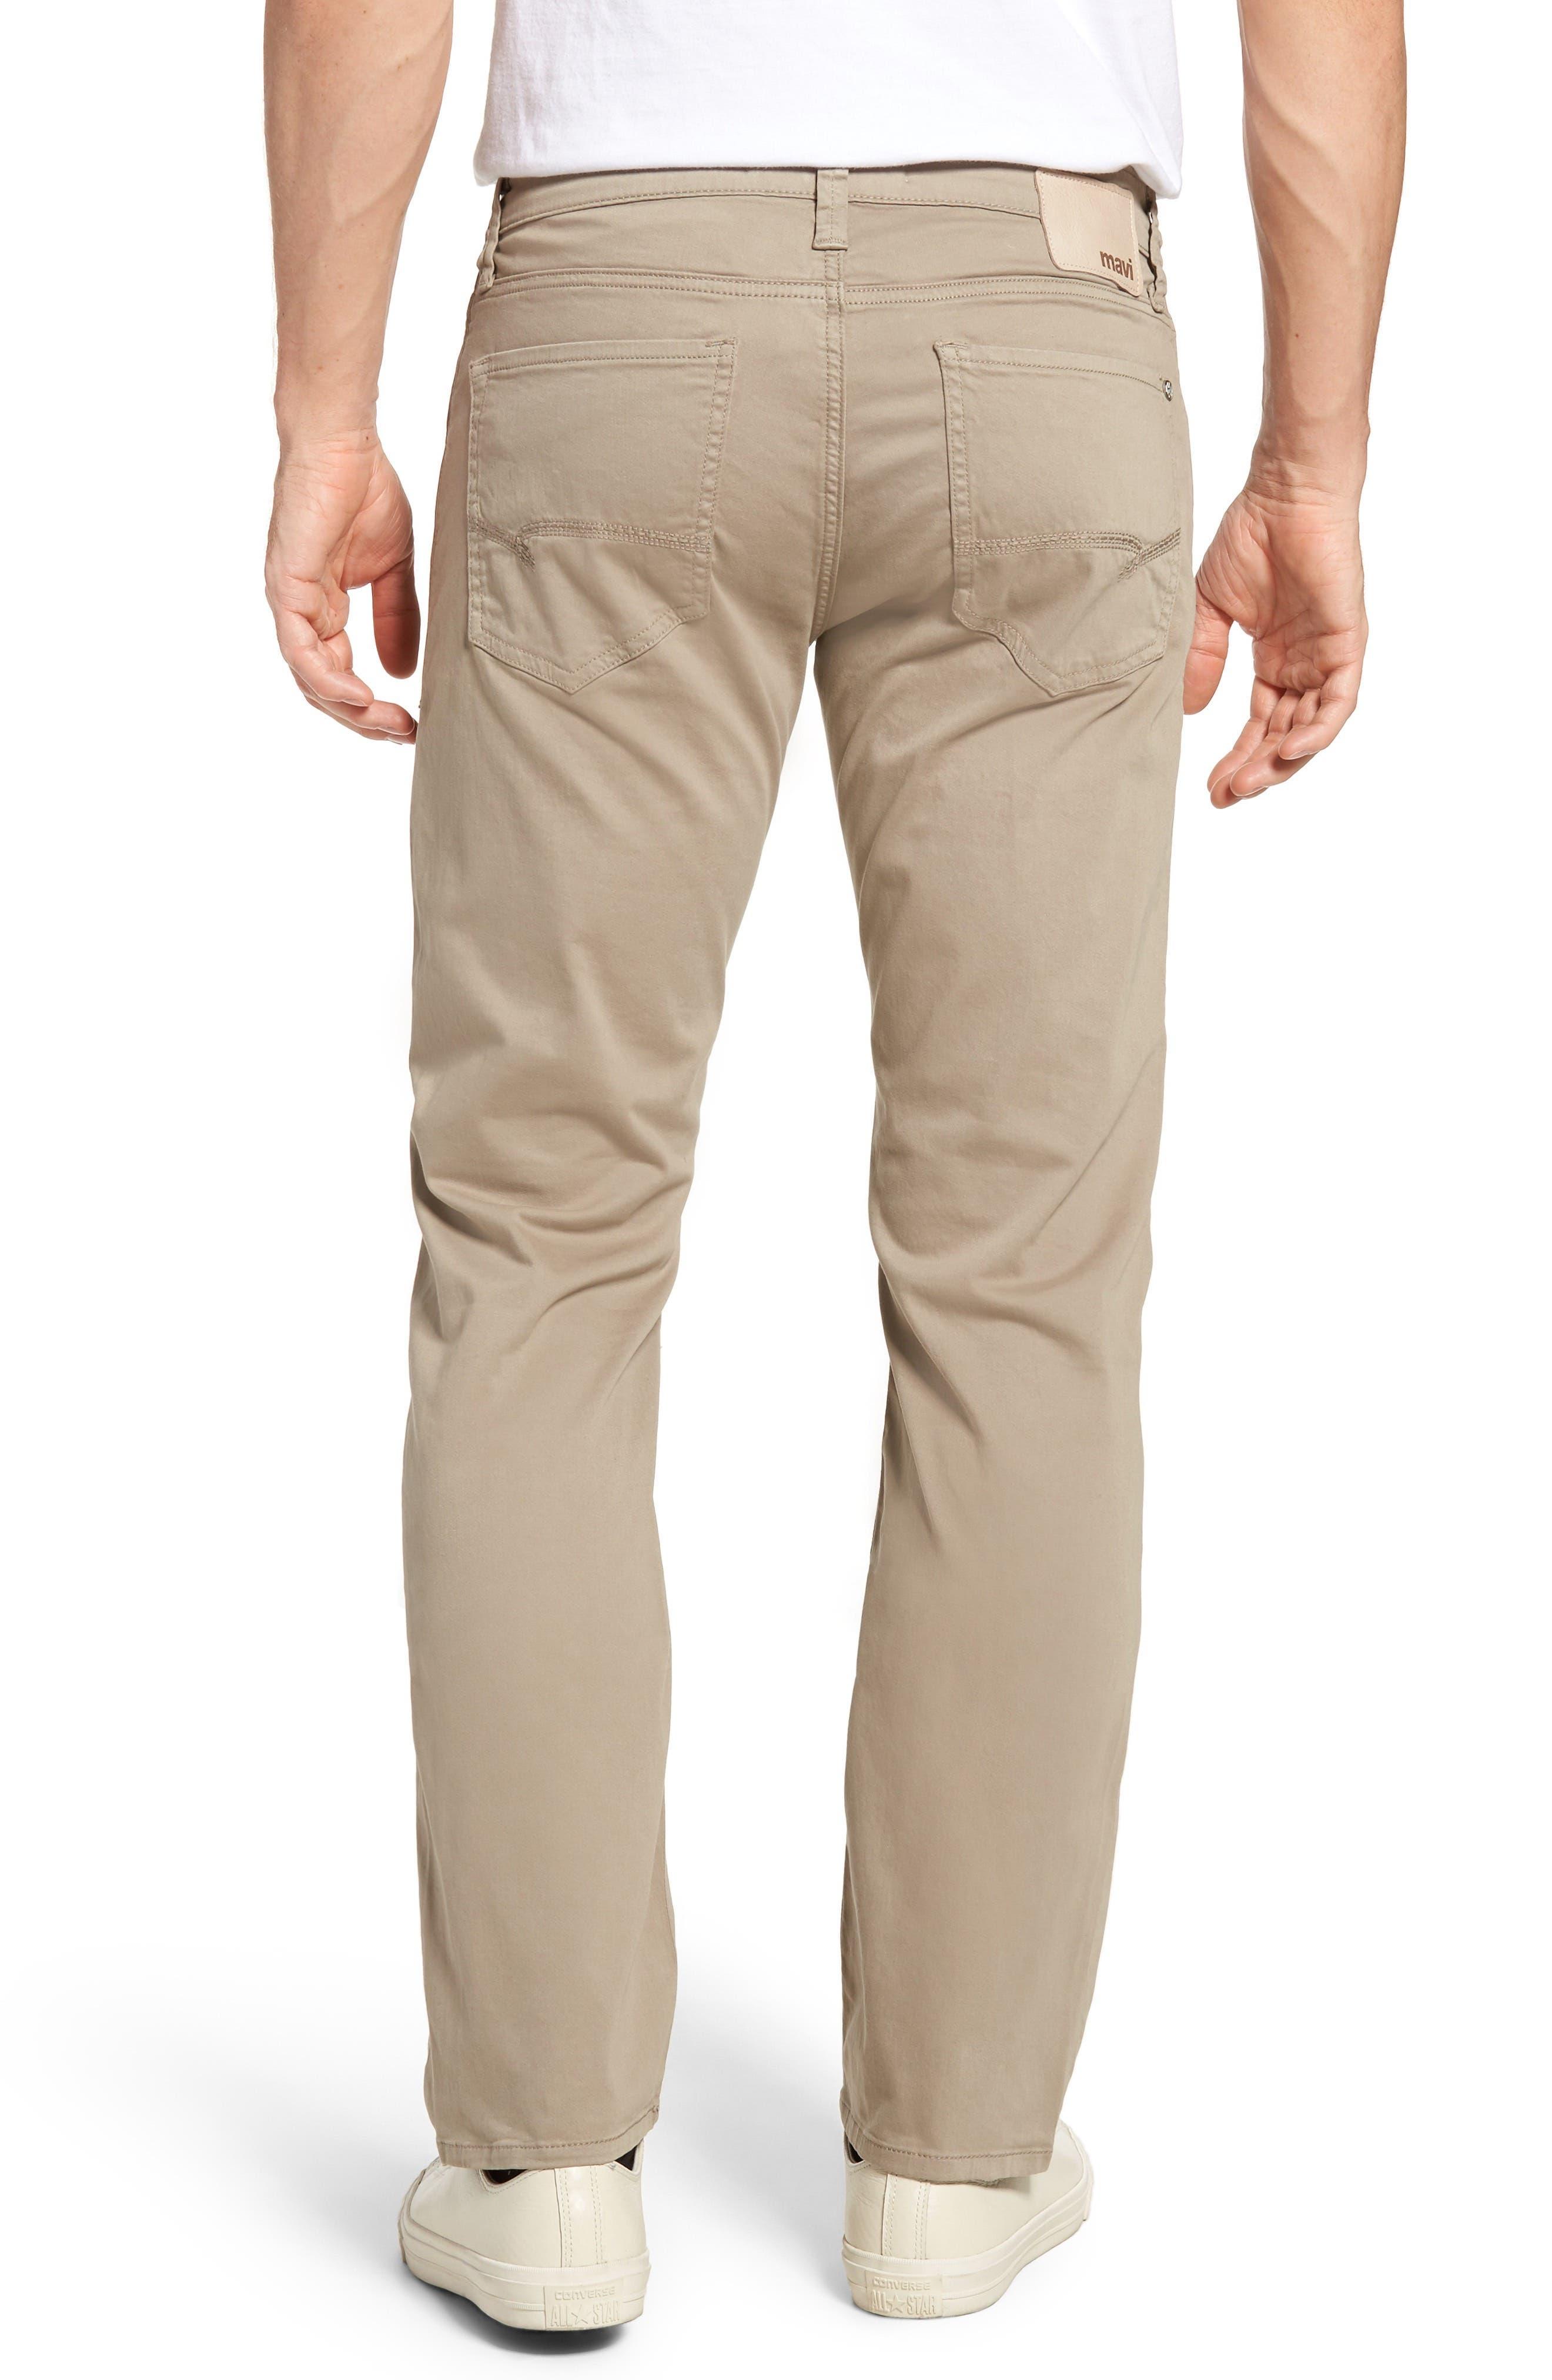 Zach Straight Leg Twill Pants,                             Alternate thumbnail 2, color,                             Beige Twill